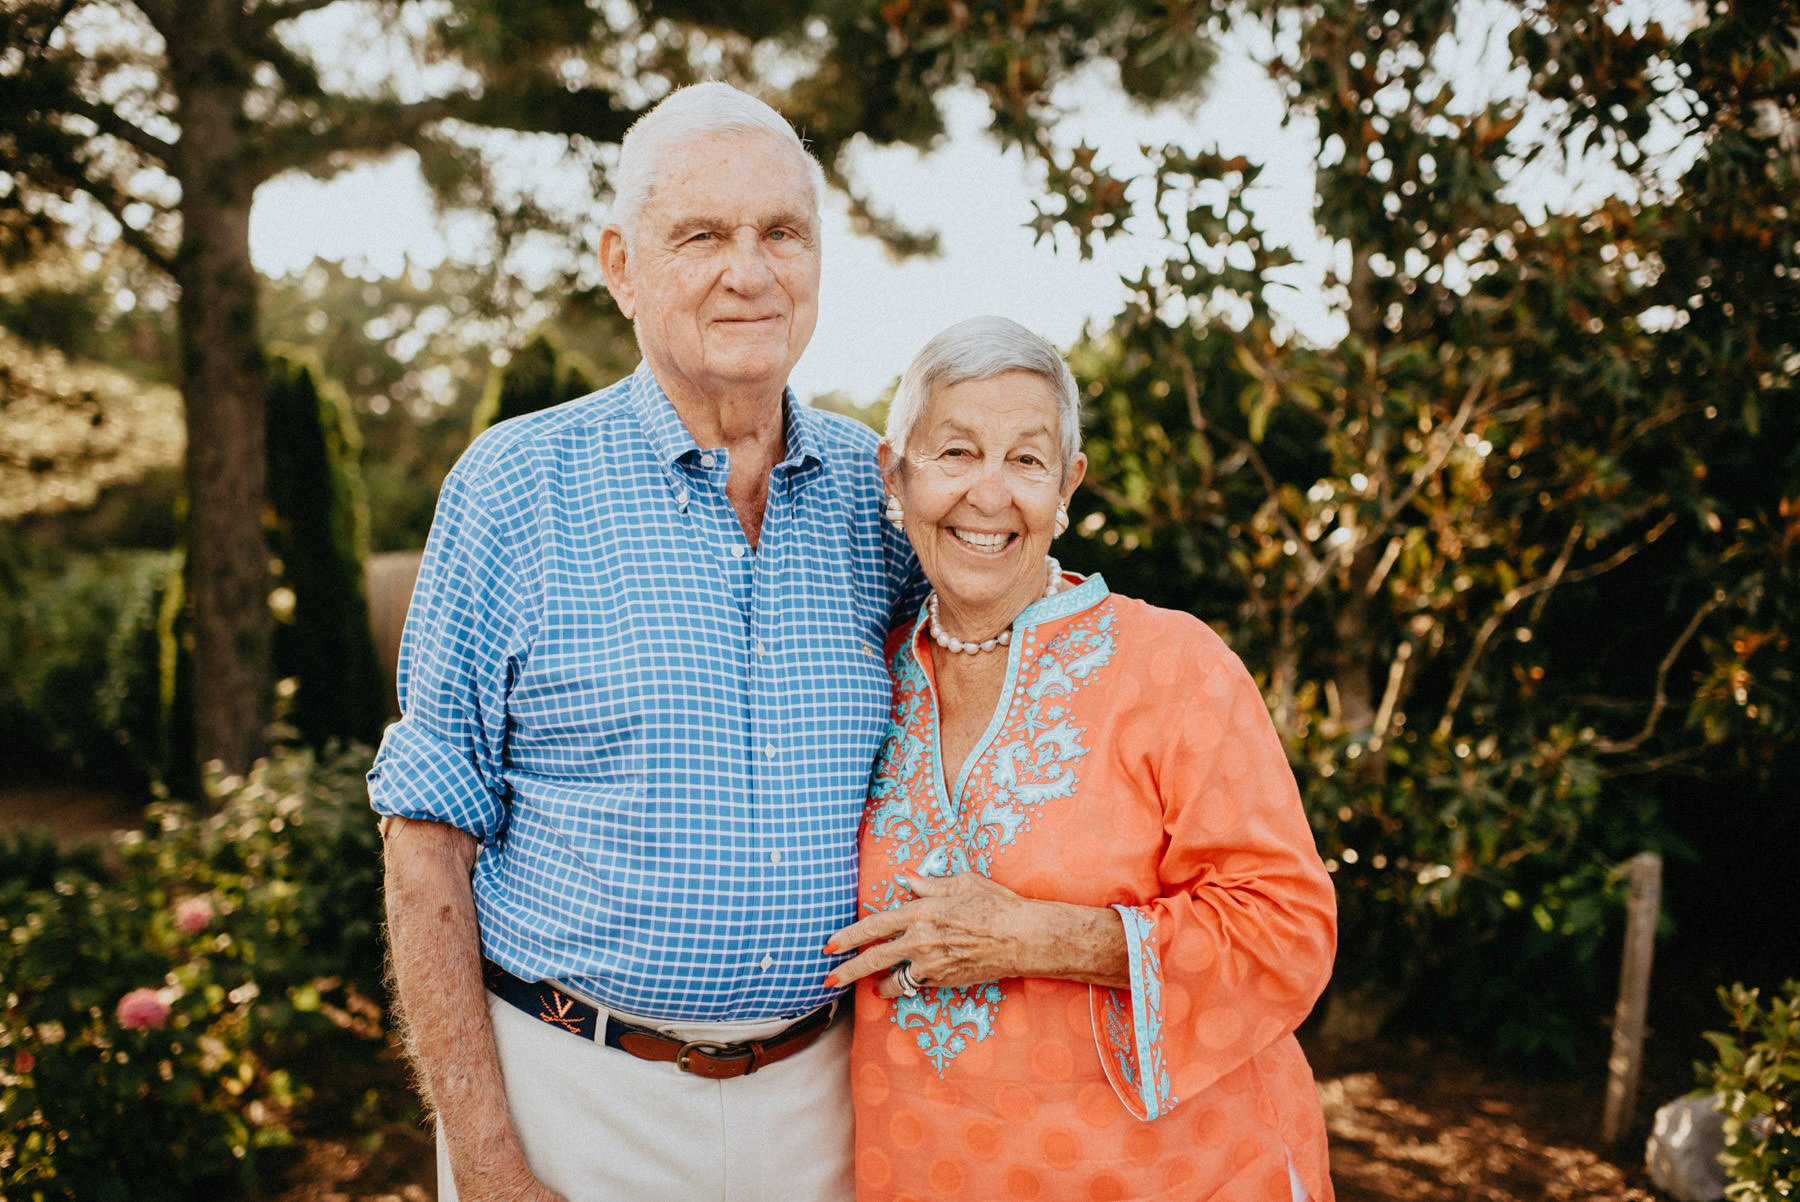 delware-pennsylvania-family-photographer-49.jpg